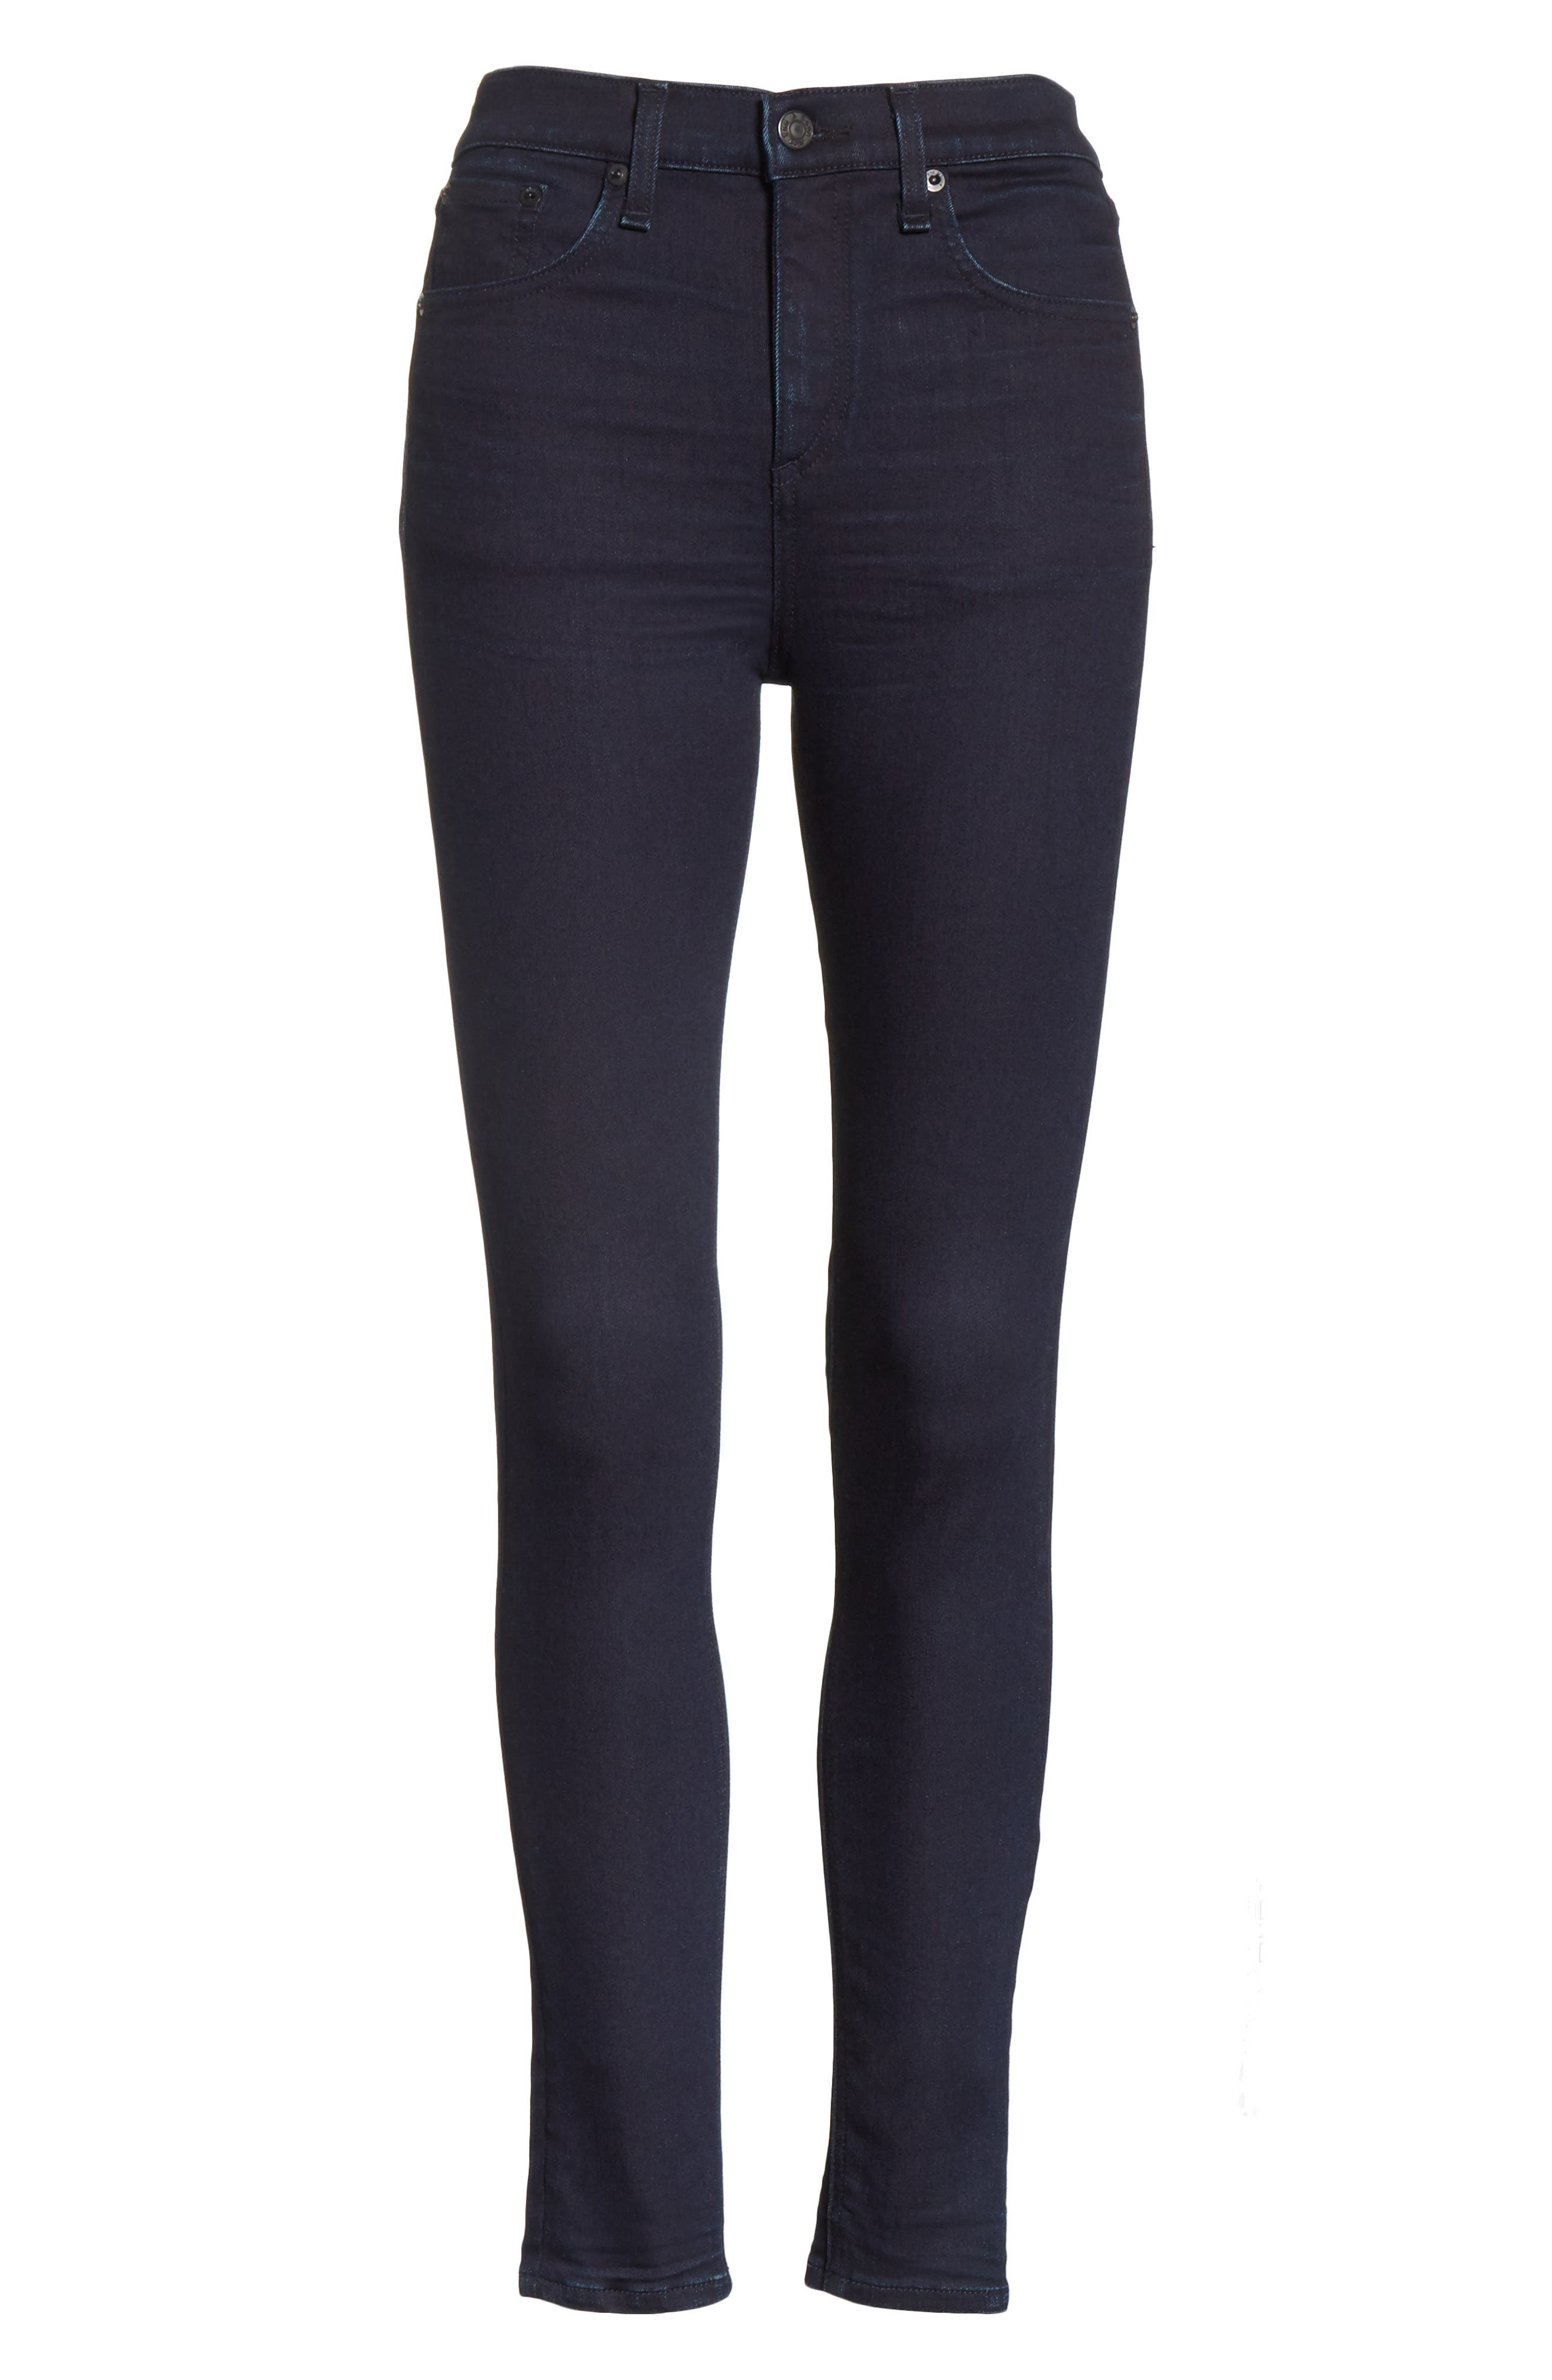 RAG & BONE,                             JEAN High Waist Ankle Skinny Jeans,                             Alternate thumbnail 6, color,                             001